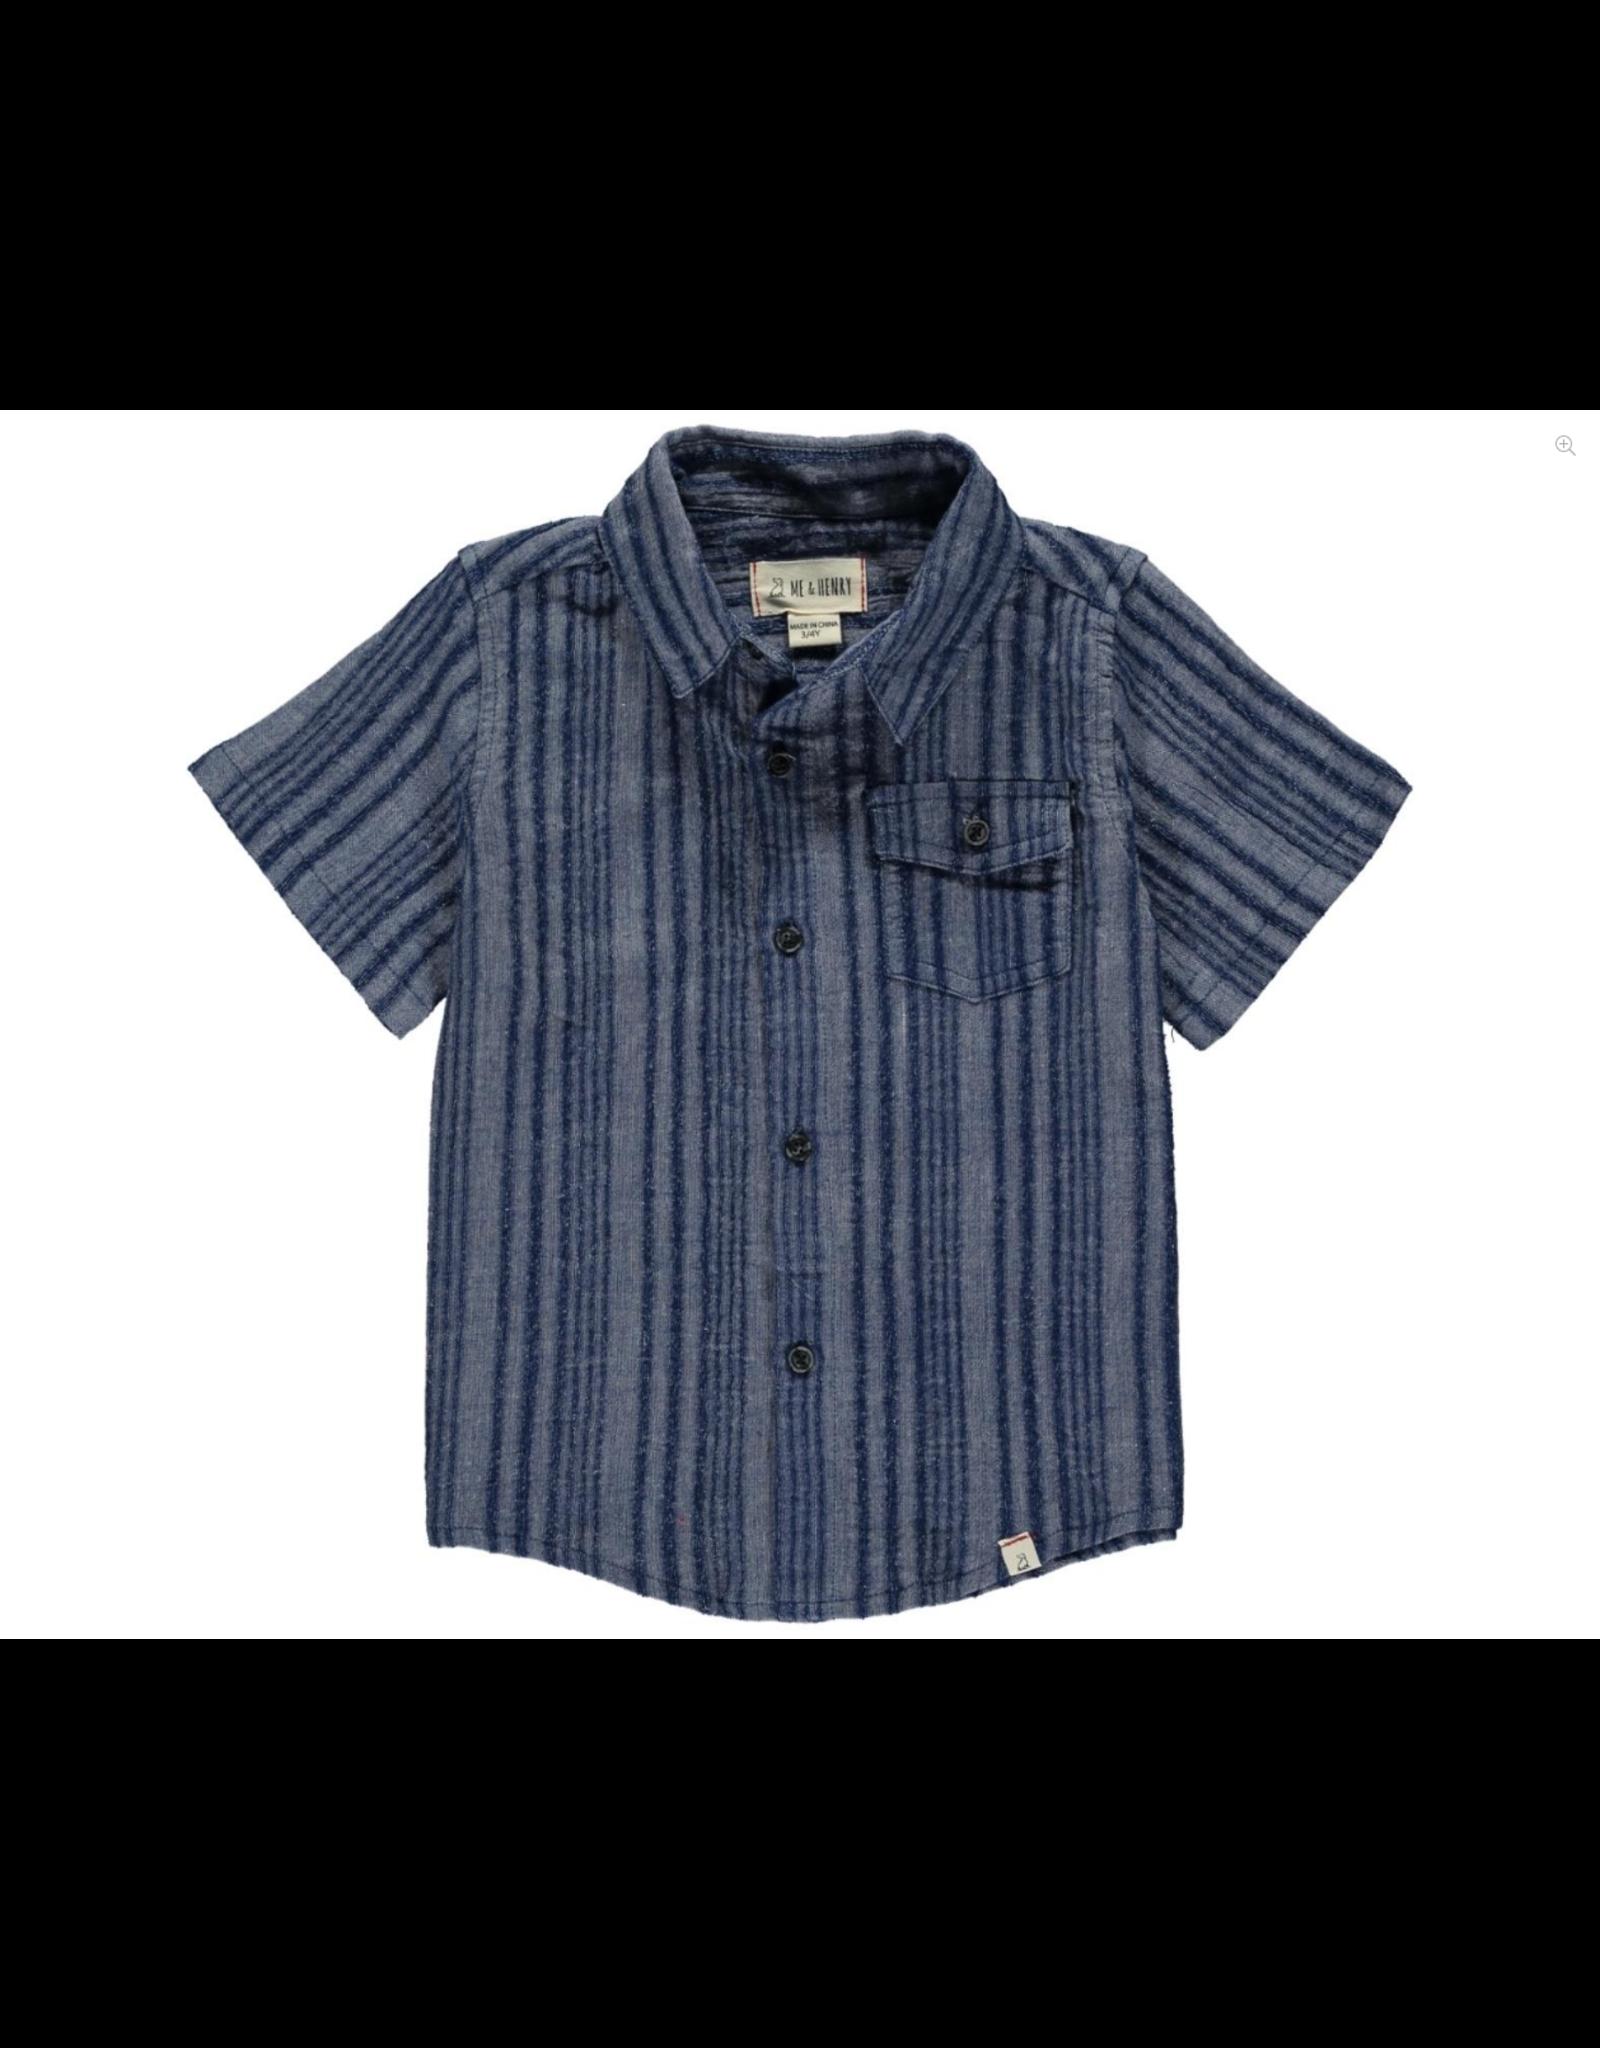 Me & Henry Me & Henry- Navy Woven S/S Shirt